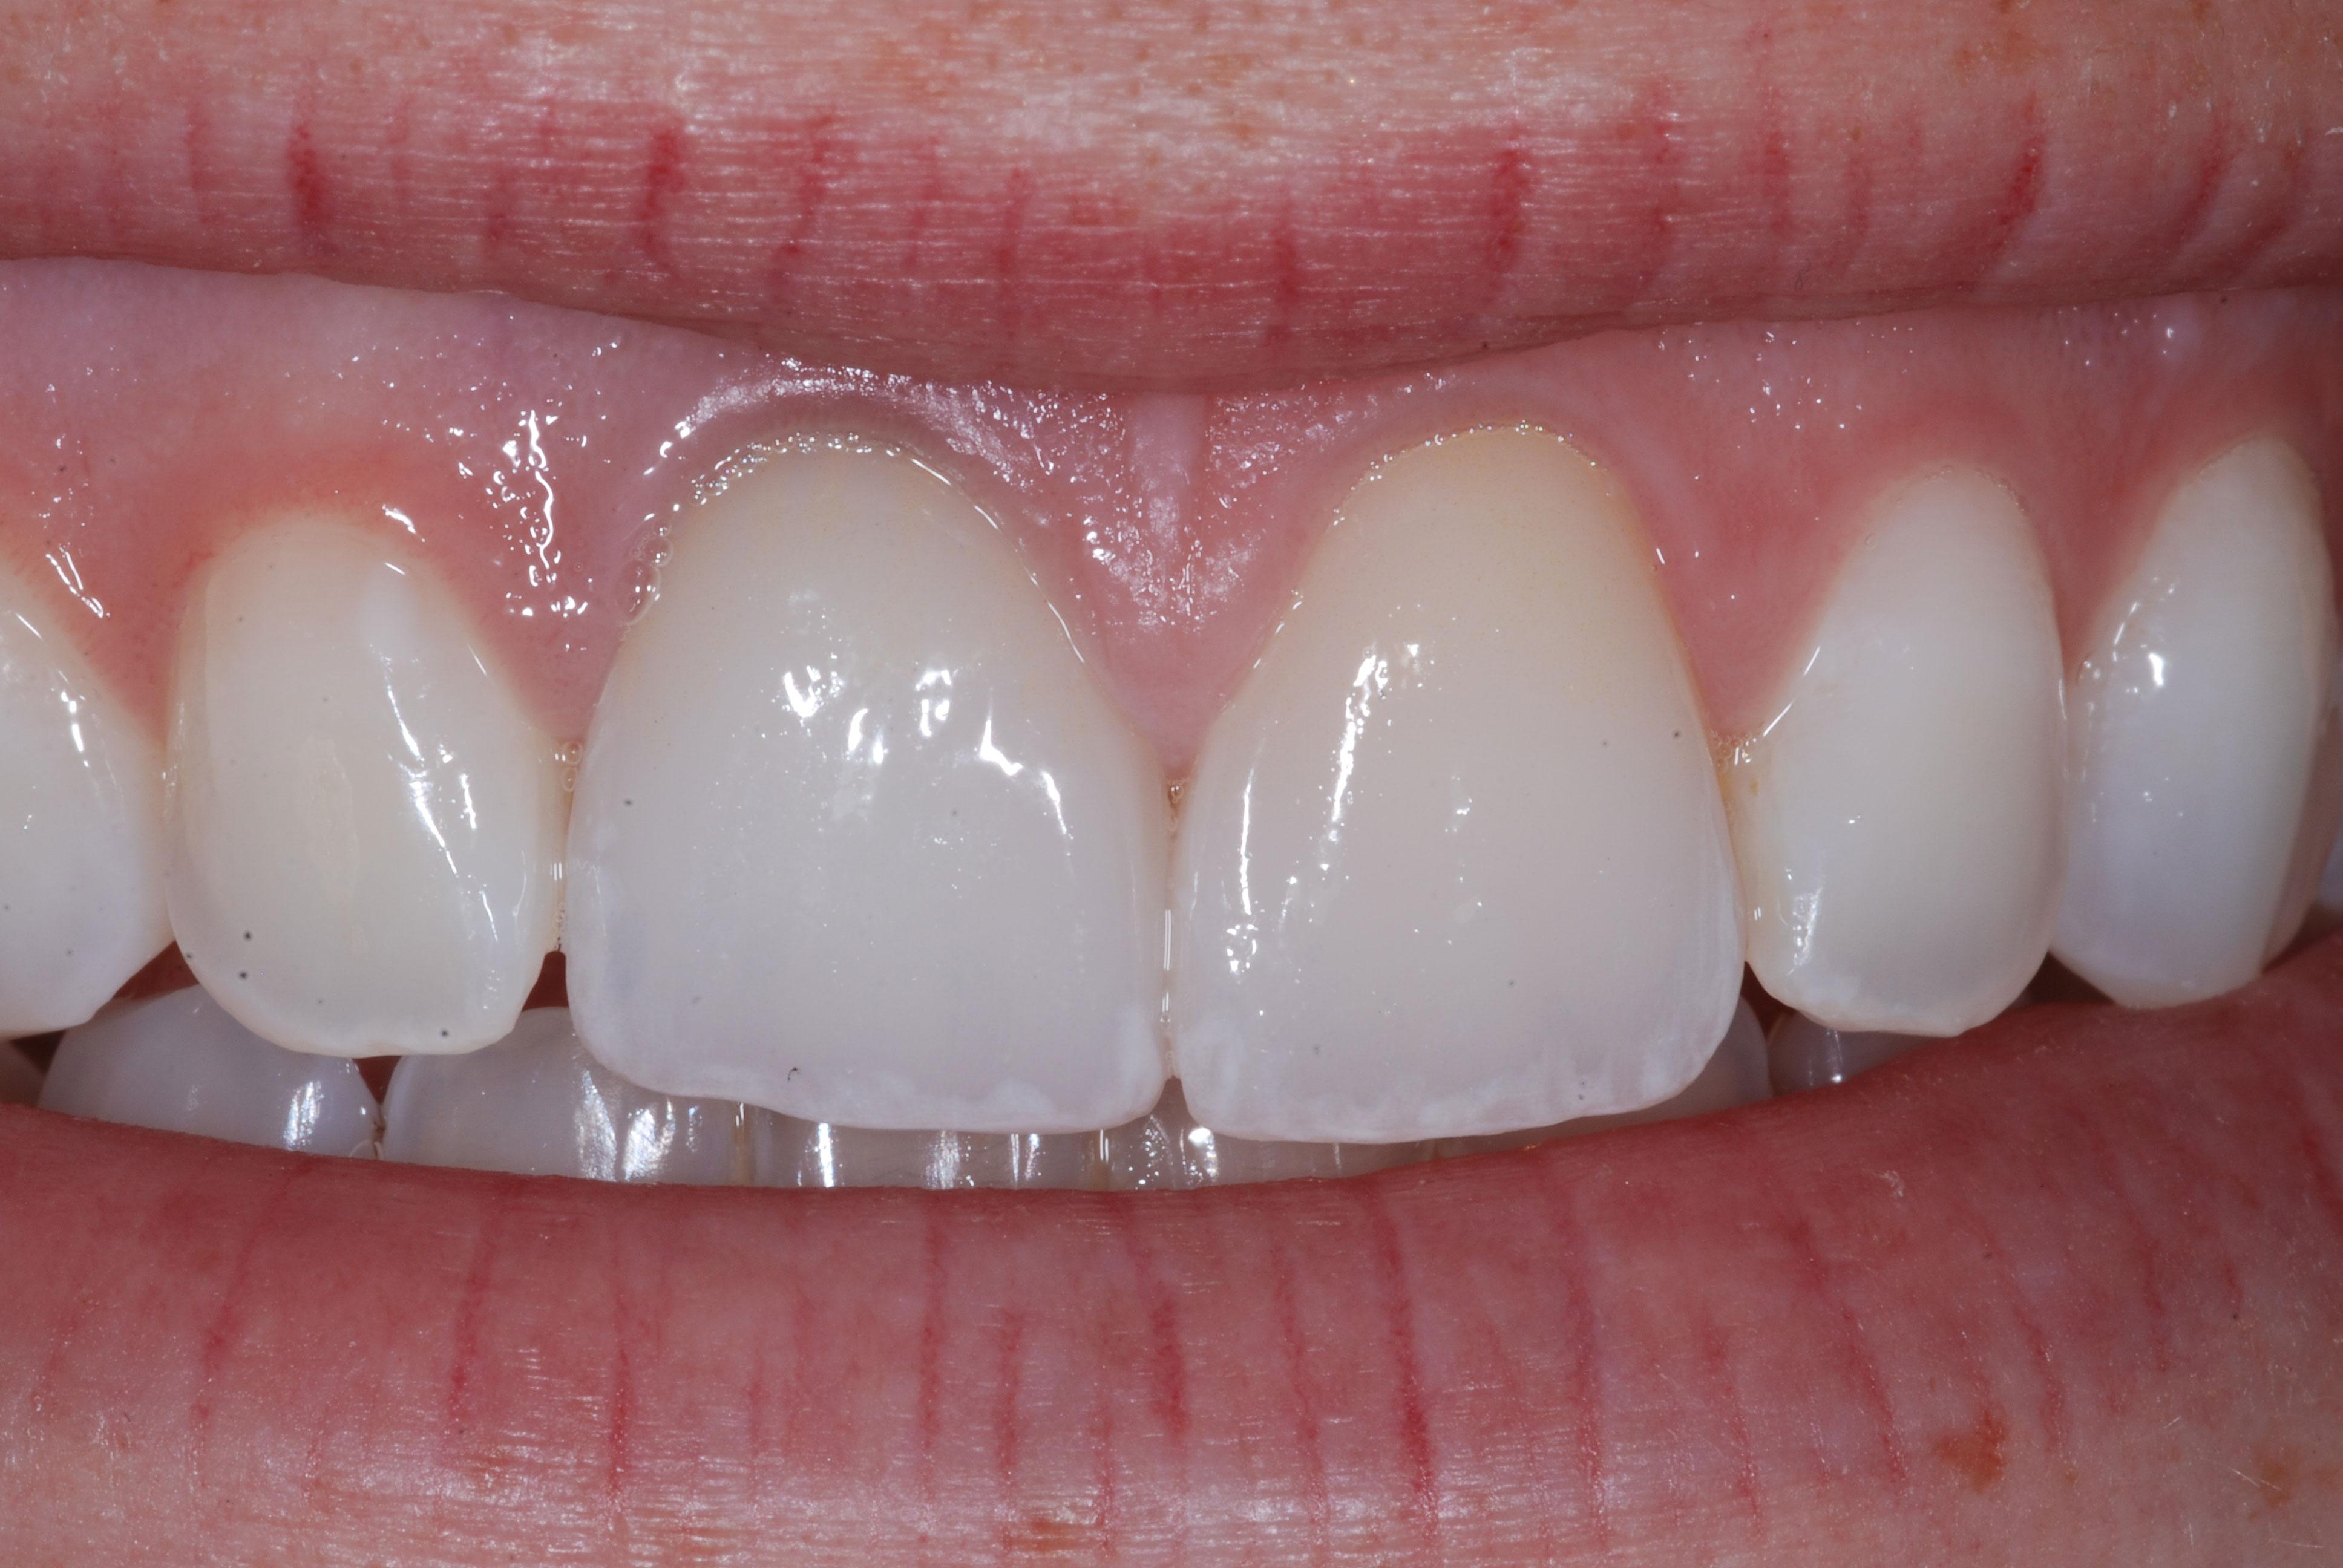 Conservative Esthetic Dentistry